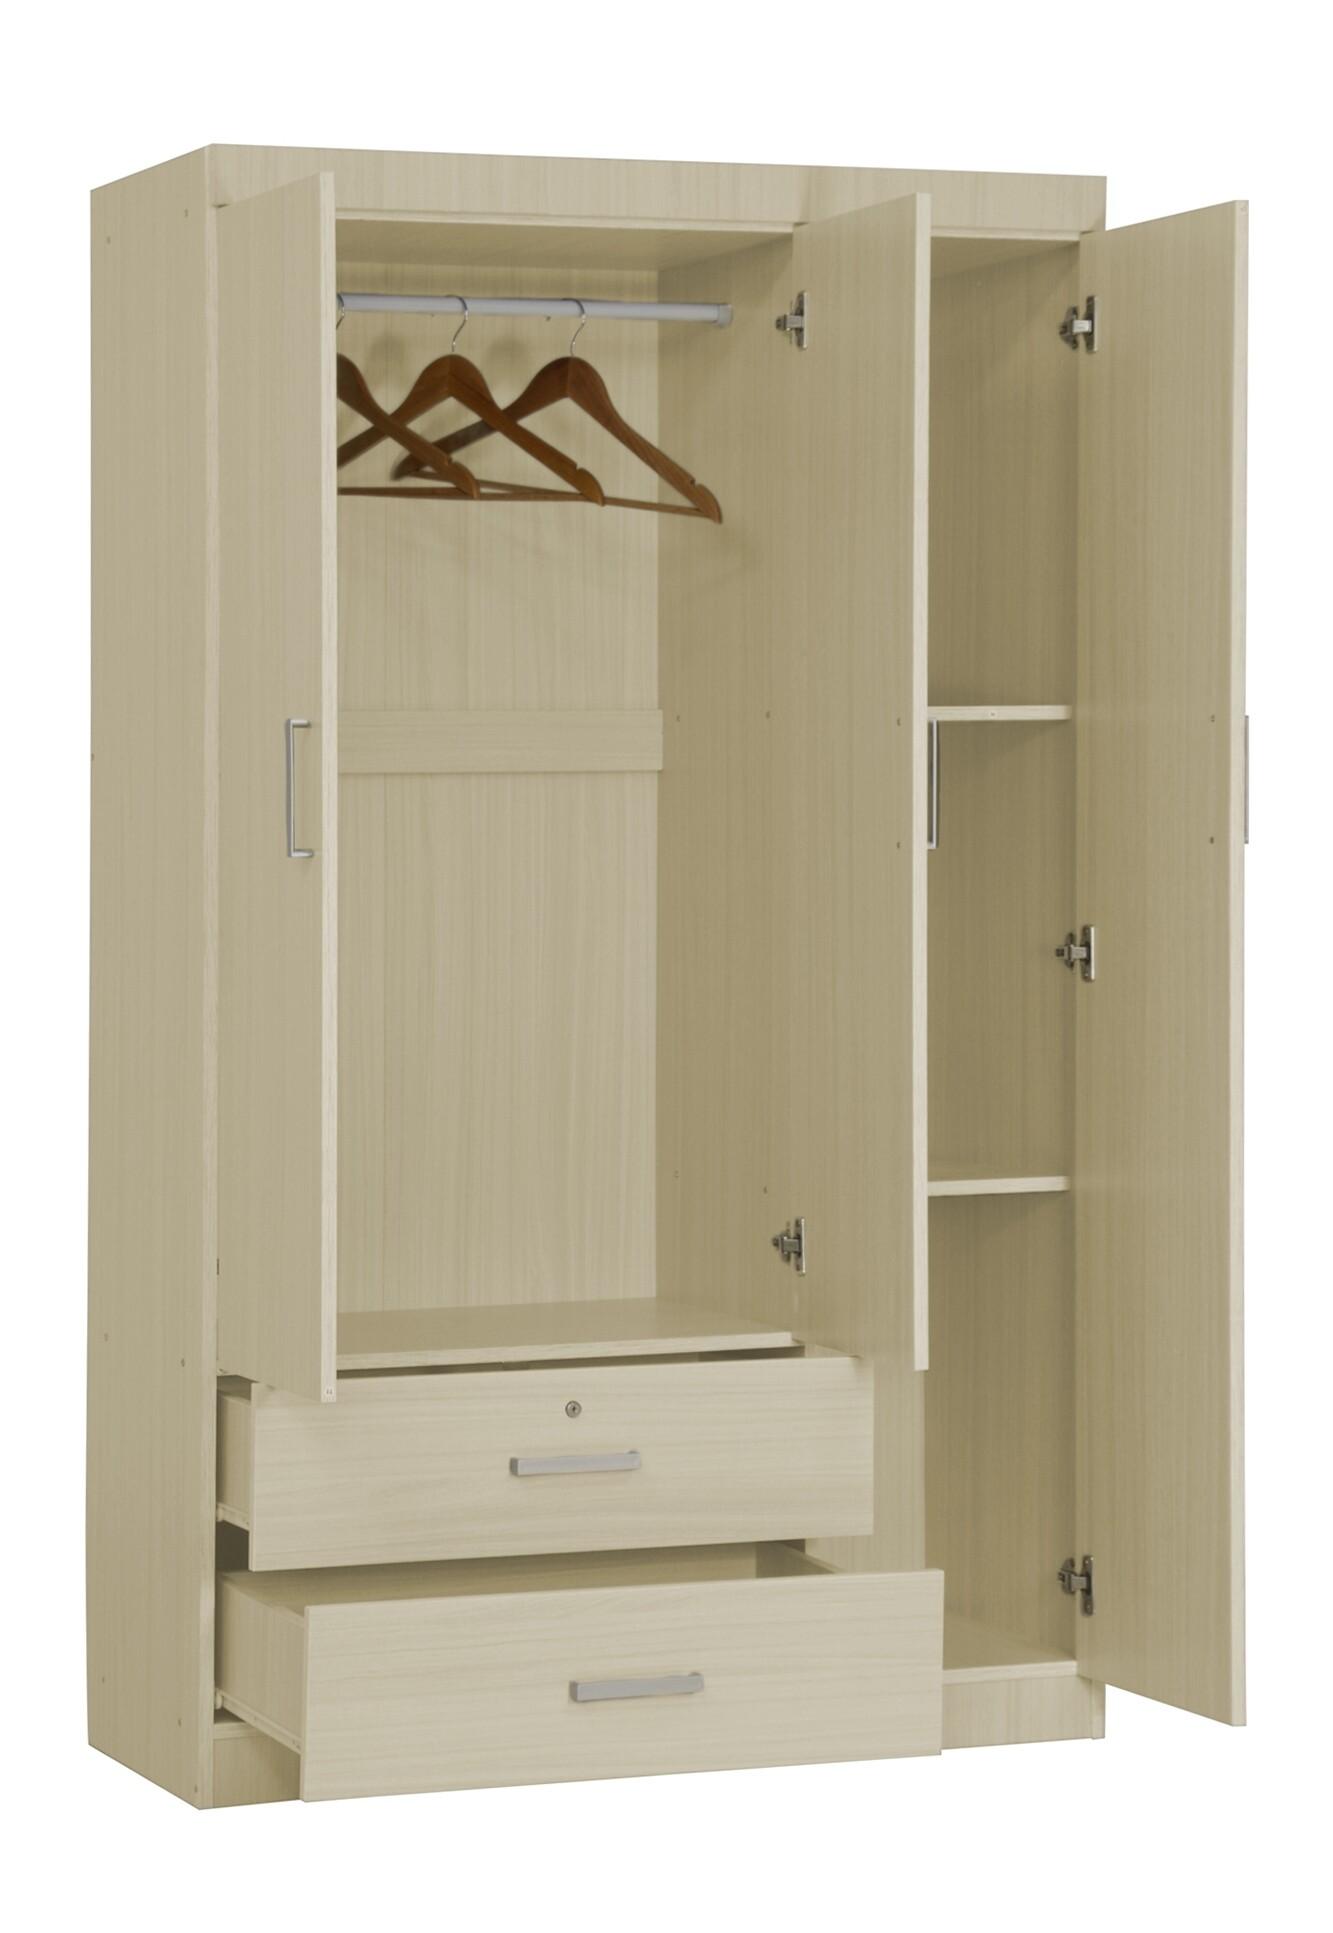 Elifel 3 Door Wardrobe In White Wash Wardrobes Bedroom Furniture Sets Furniture Home Decor Fortytwo